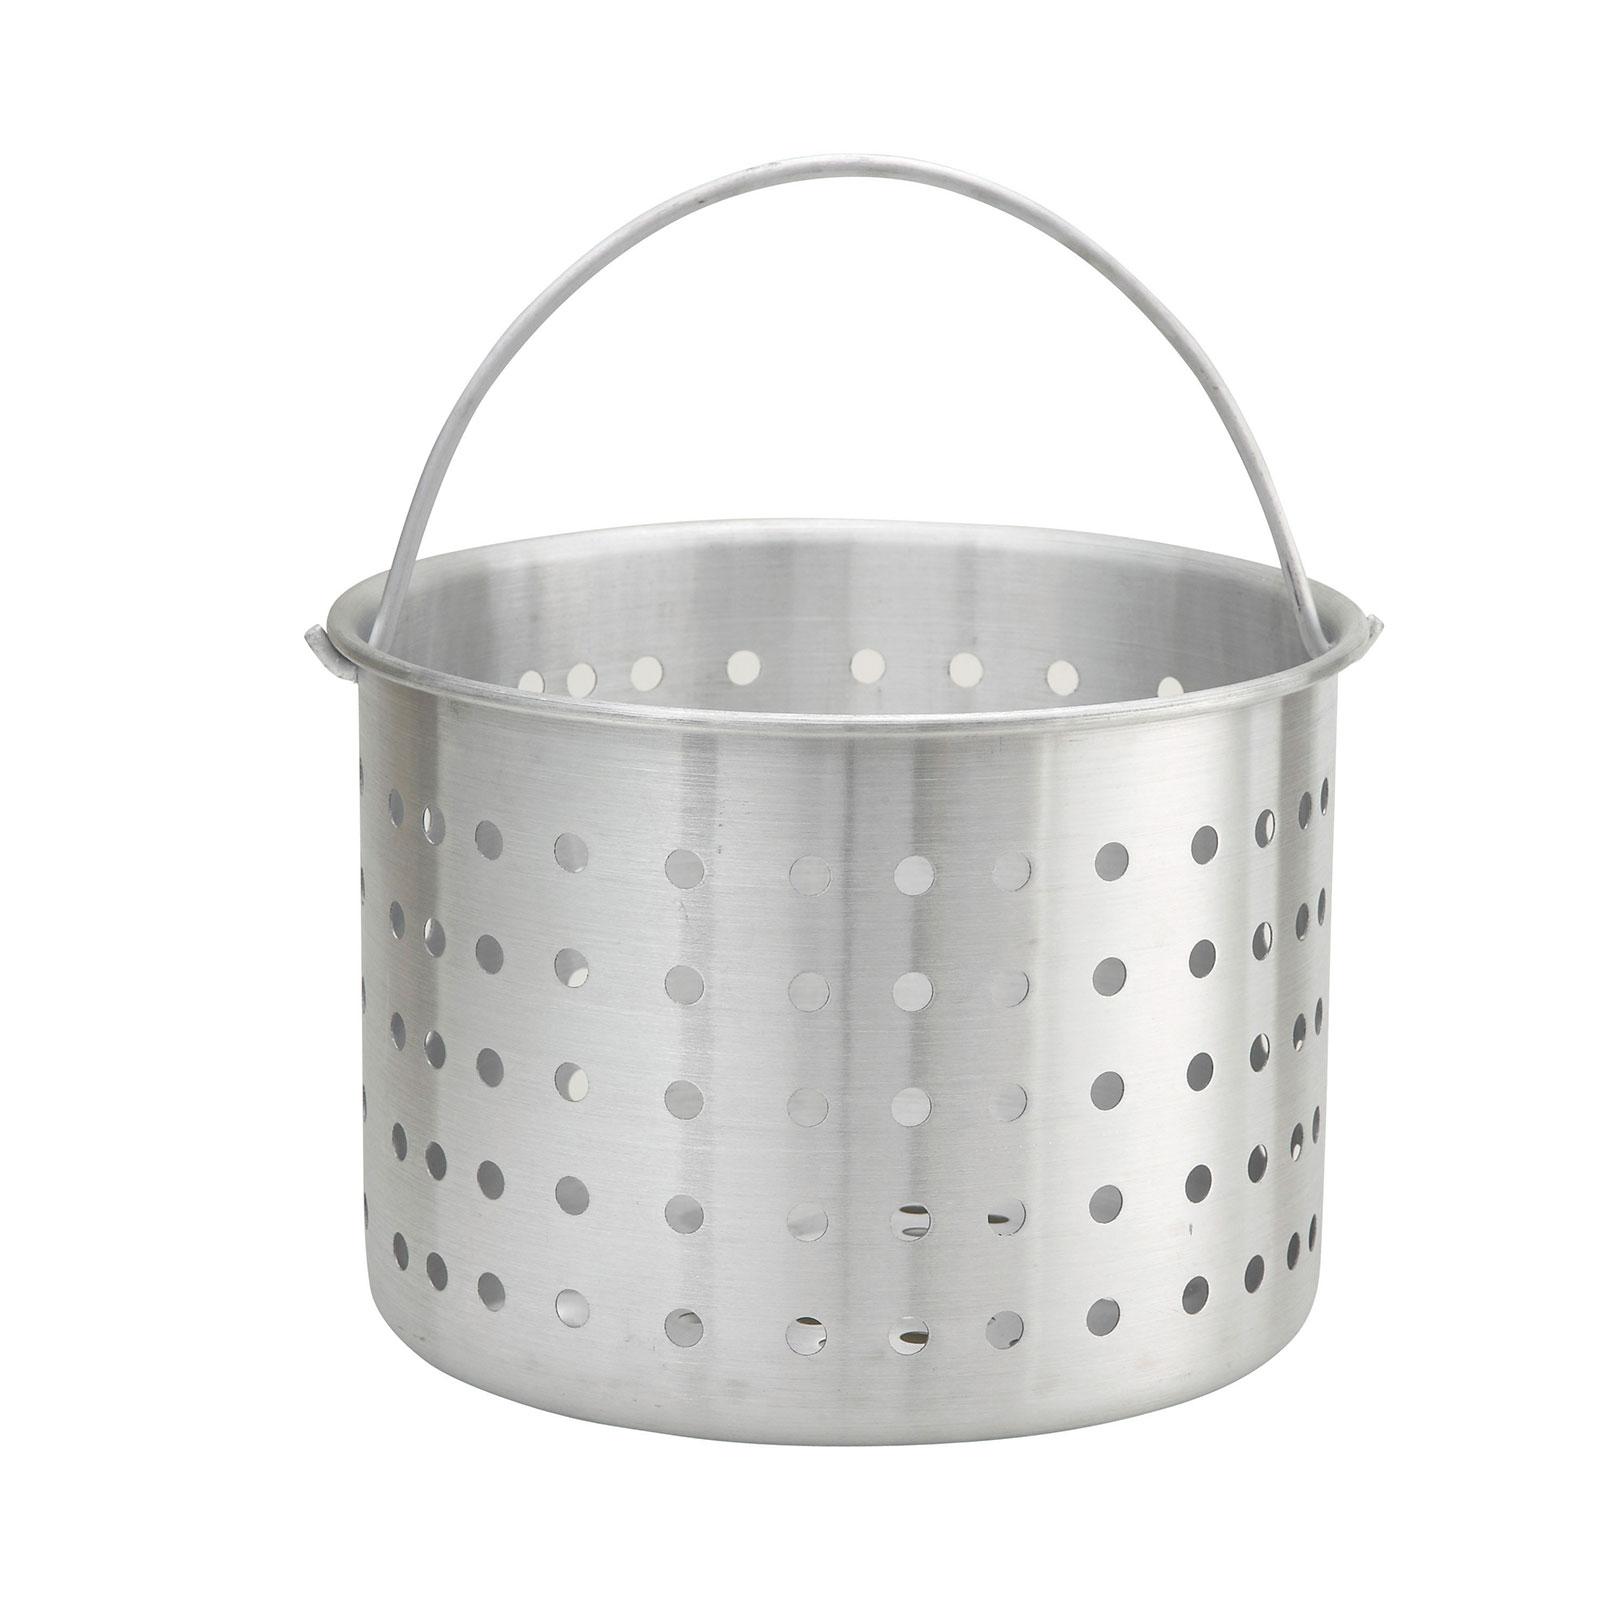 1000-32 Winco ALSB-60 stock / steam pot, steamer basket